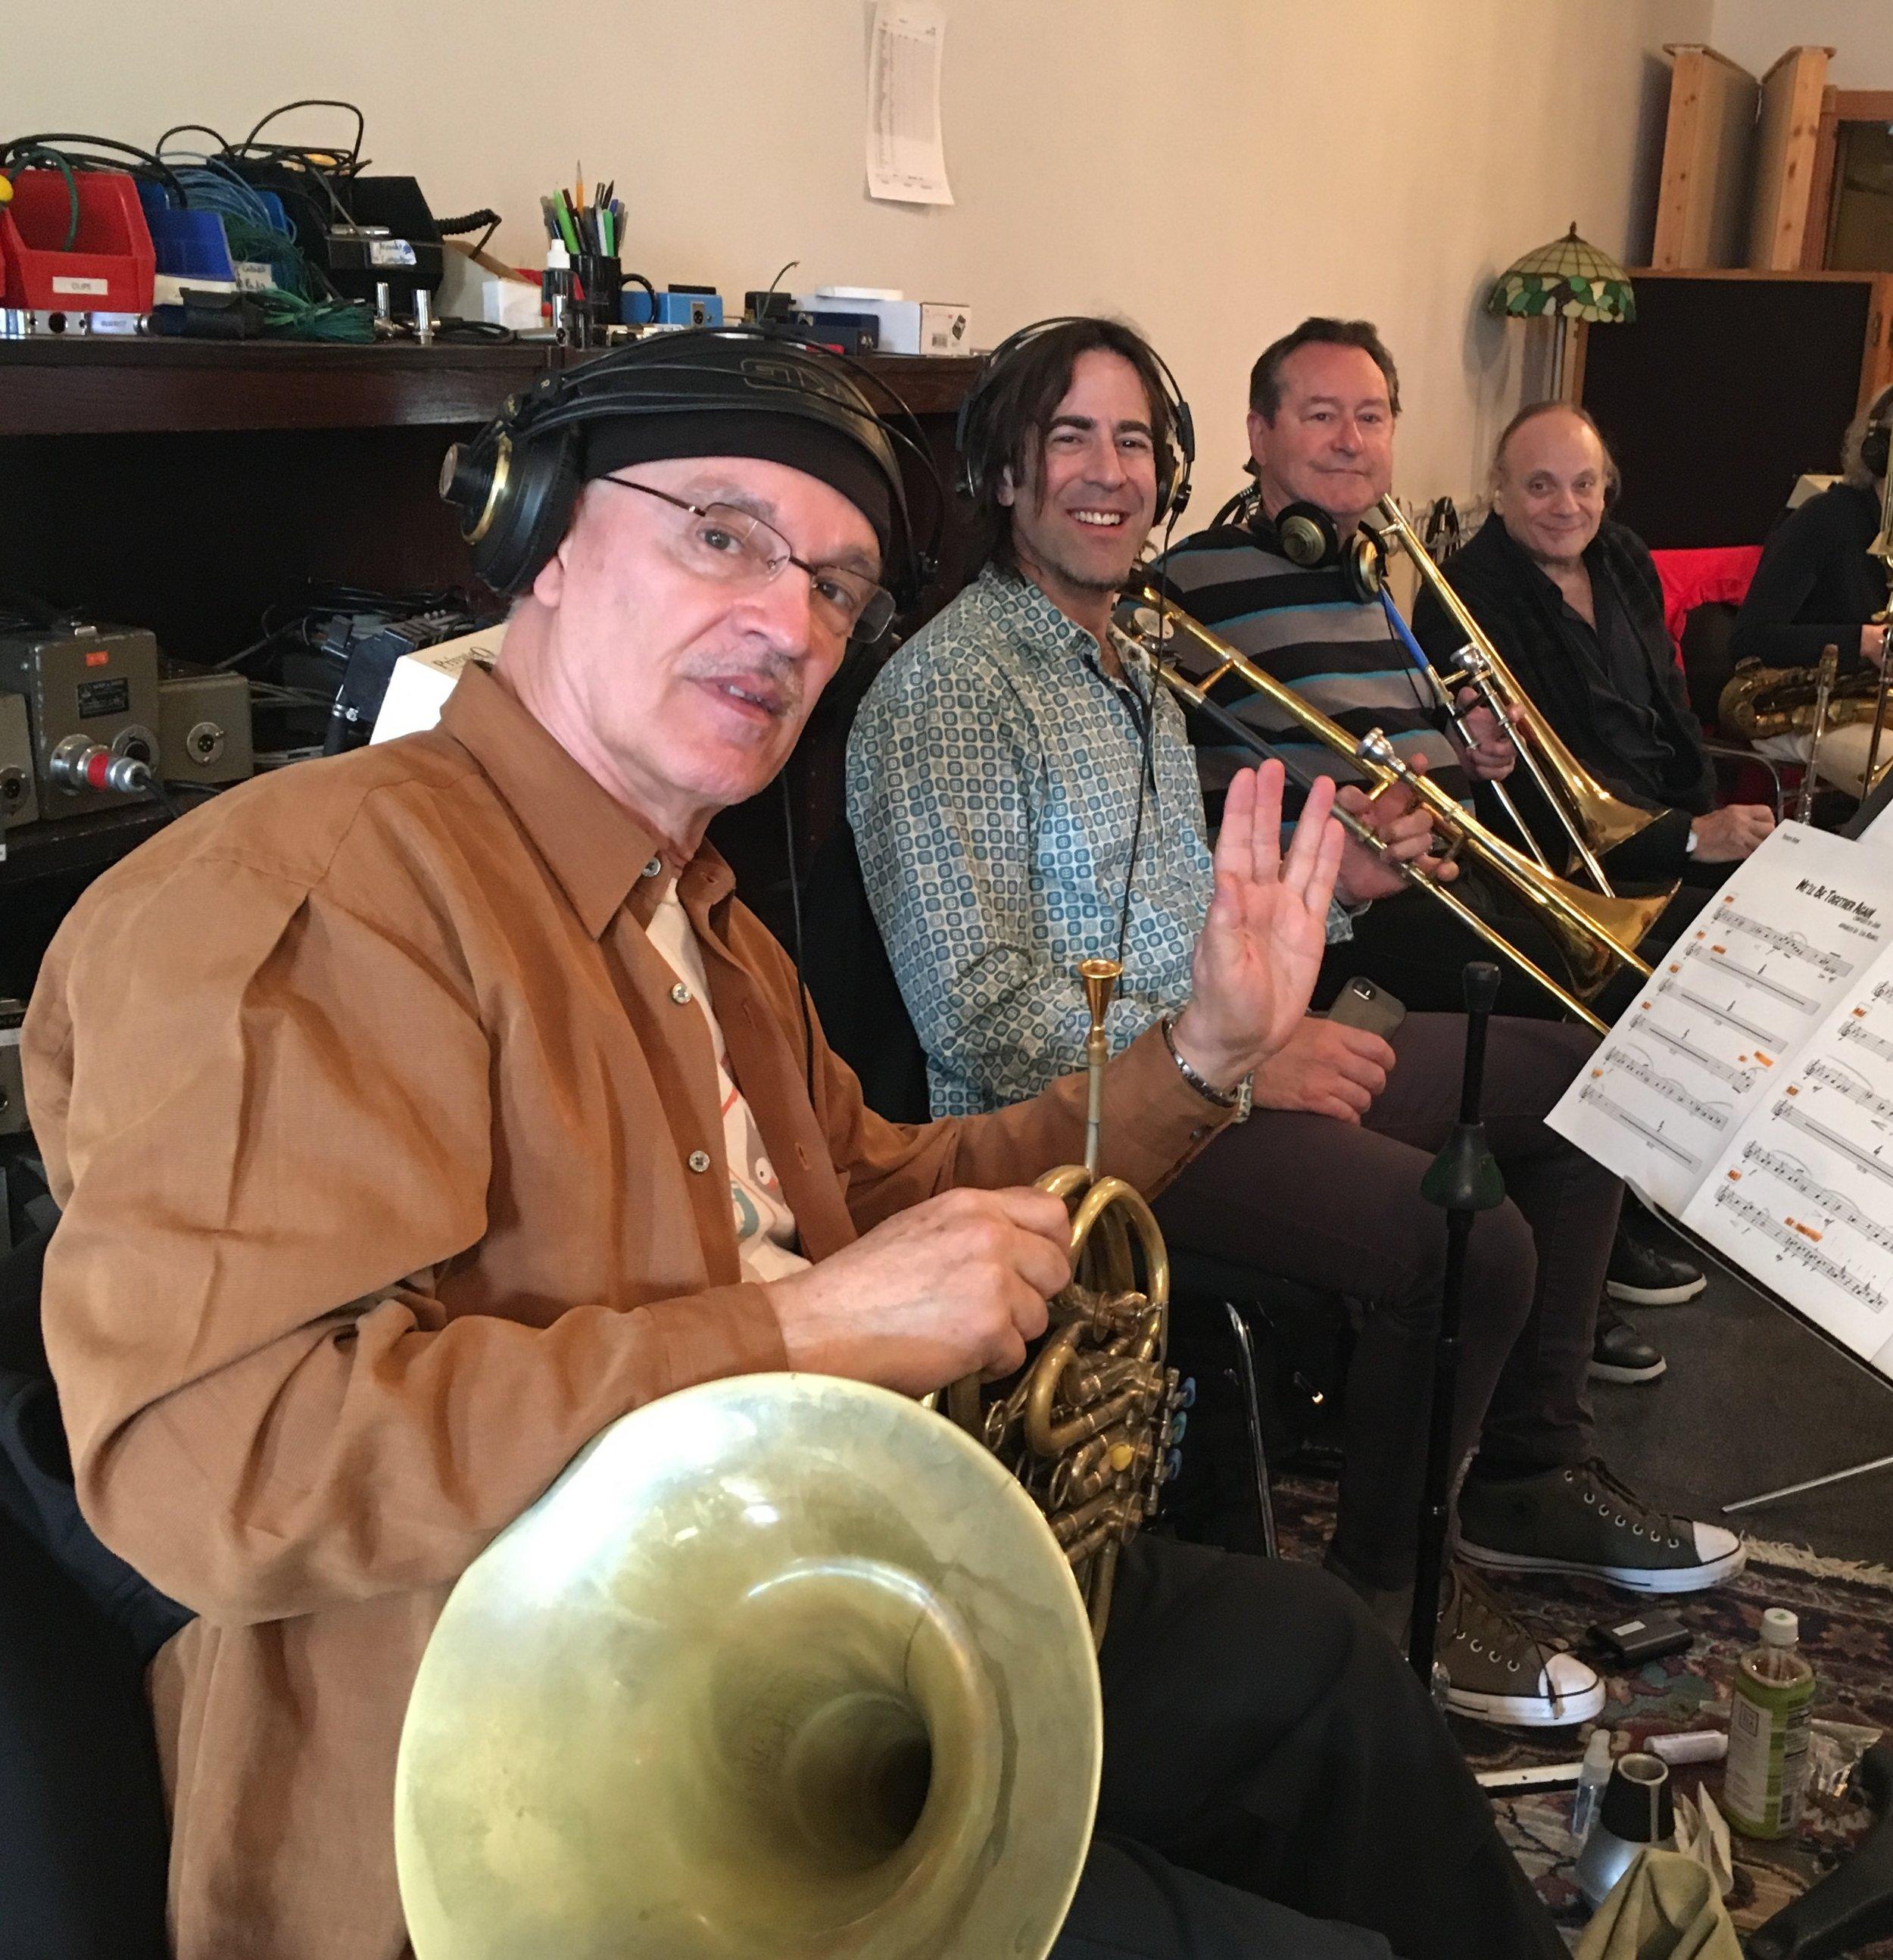 John Clark, Dan Levine, Tom Malone, Dave Taylor! Bones for life.